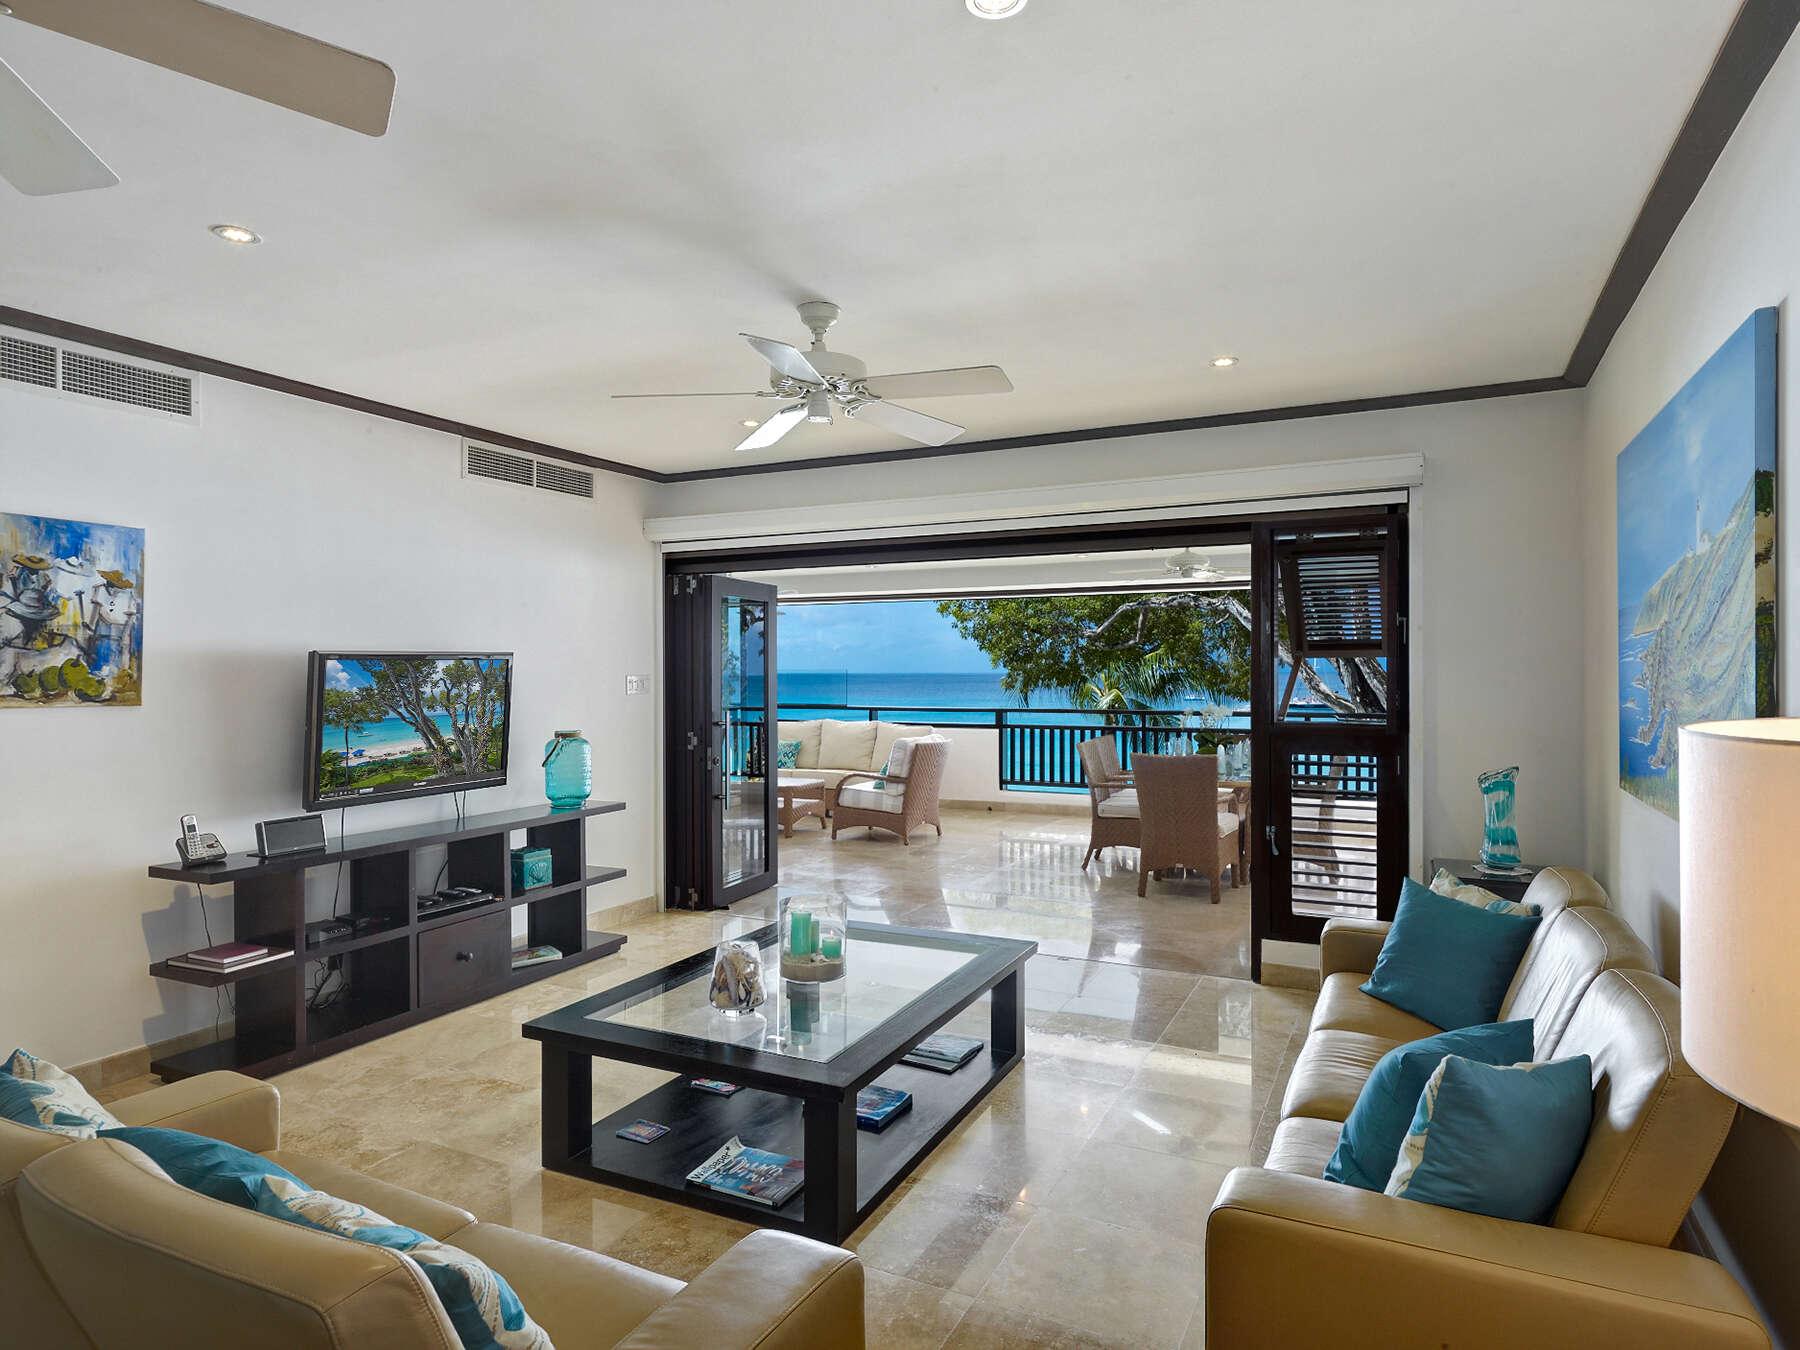 Luxury villa rentals caribbean - Barbados - St james - Coral cove - Sunset - Image 1/9